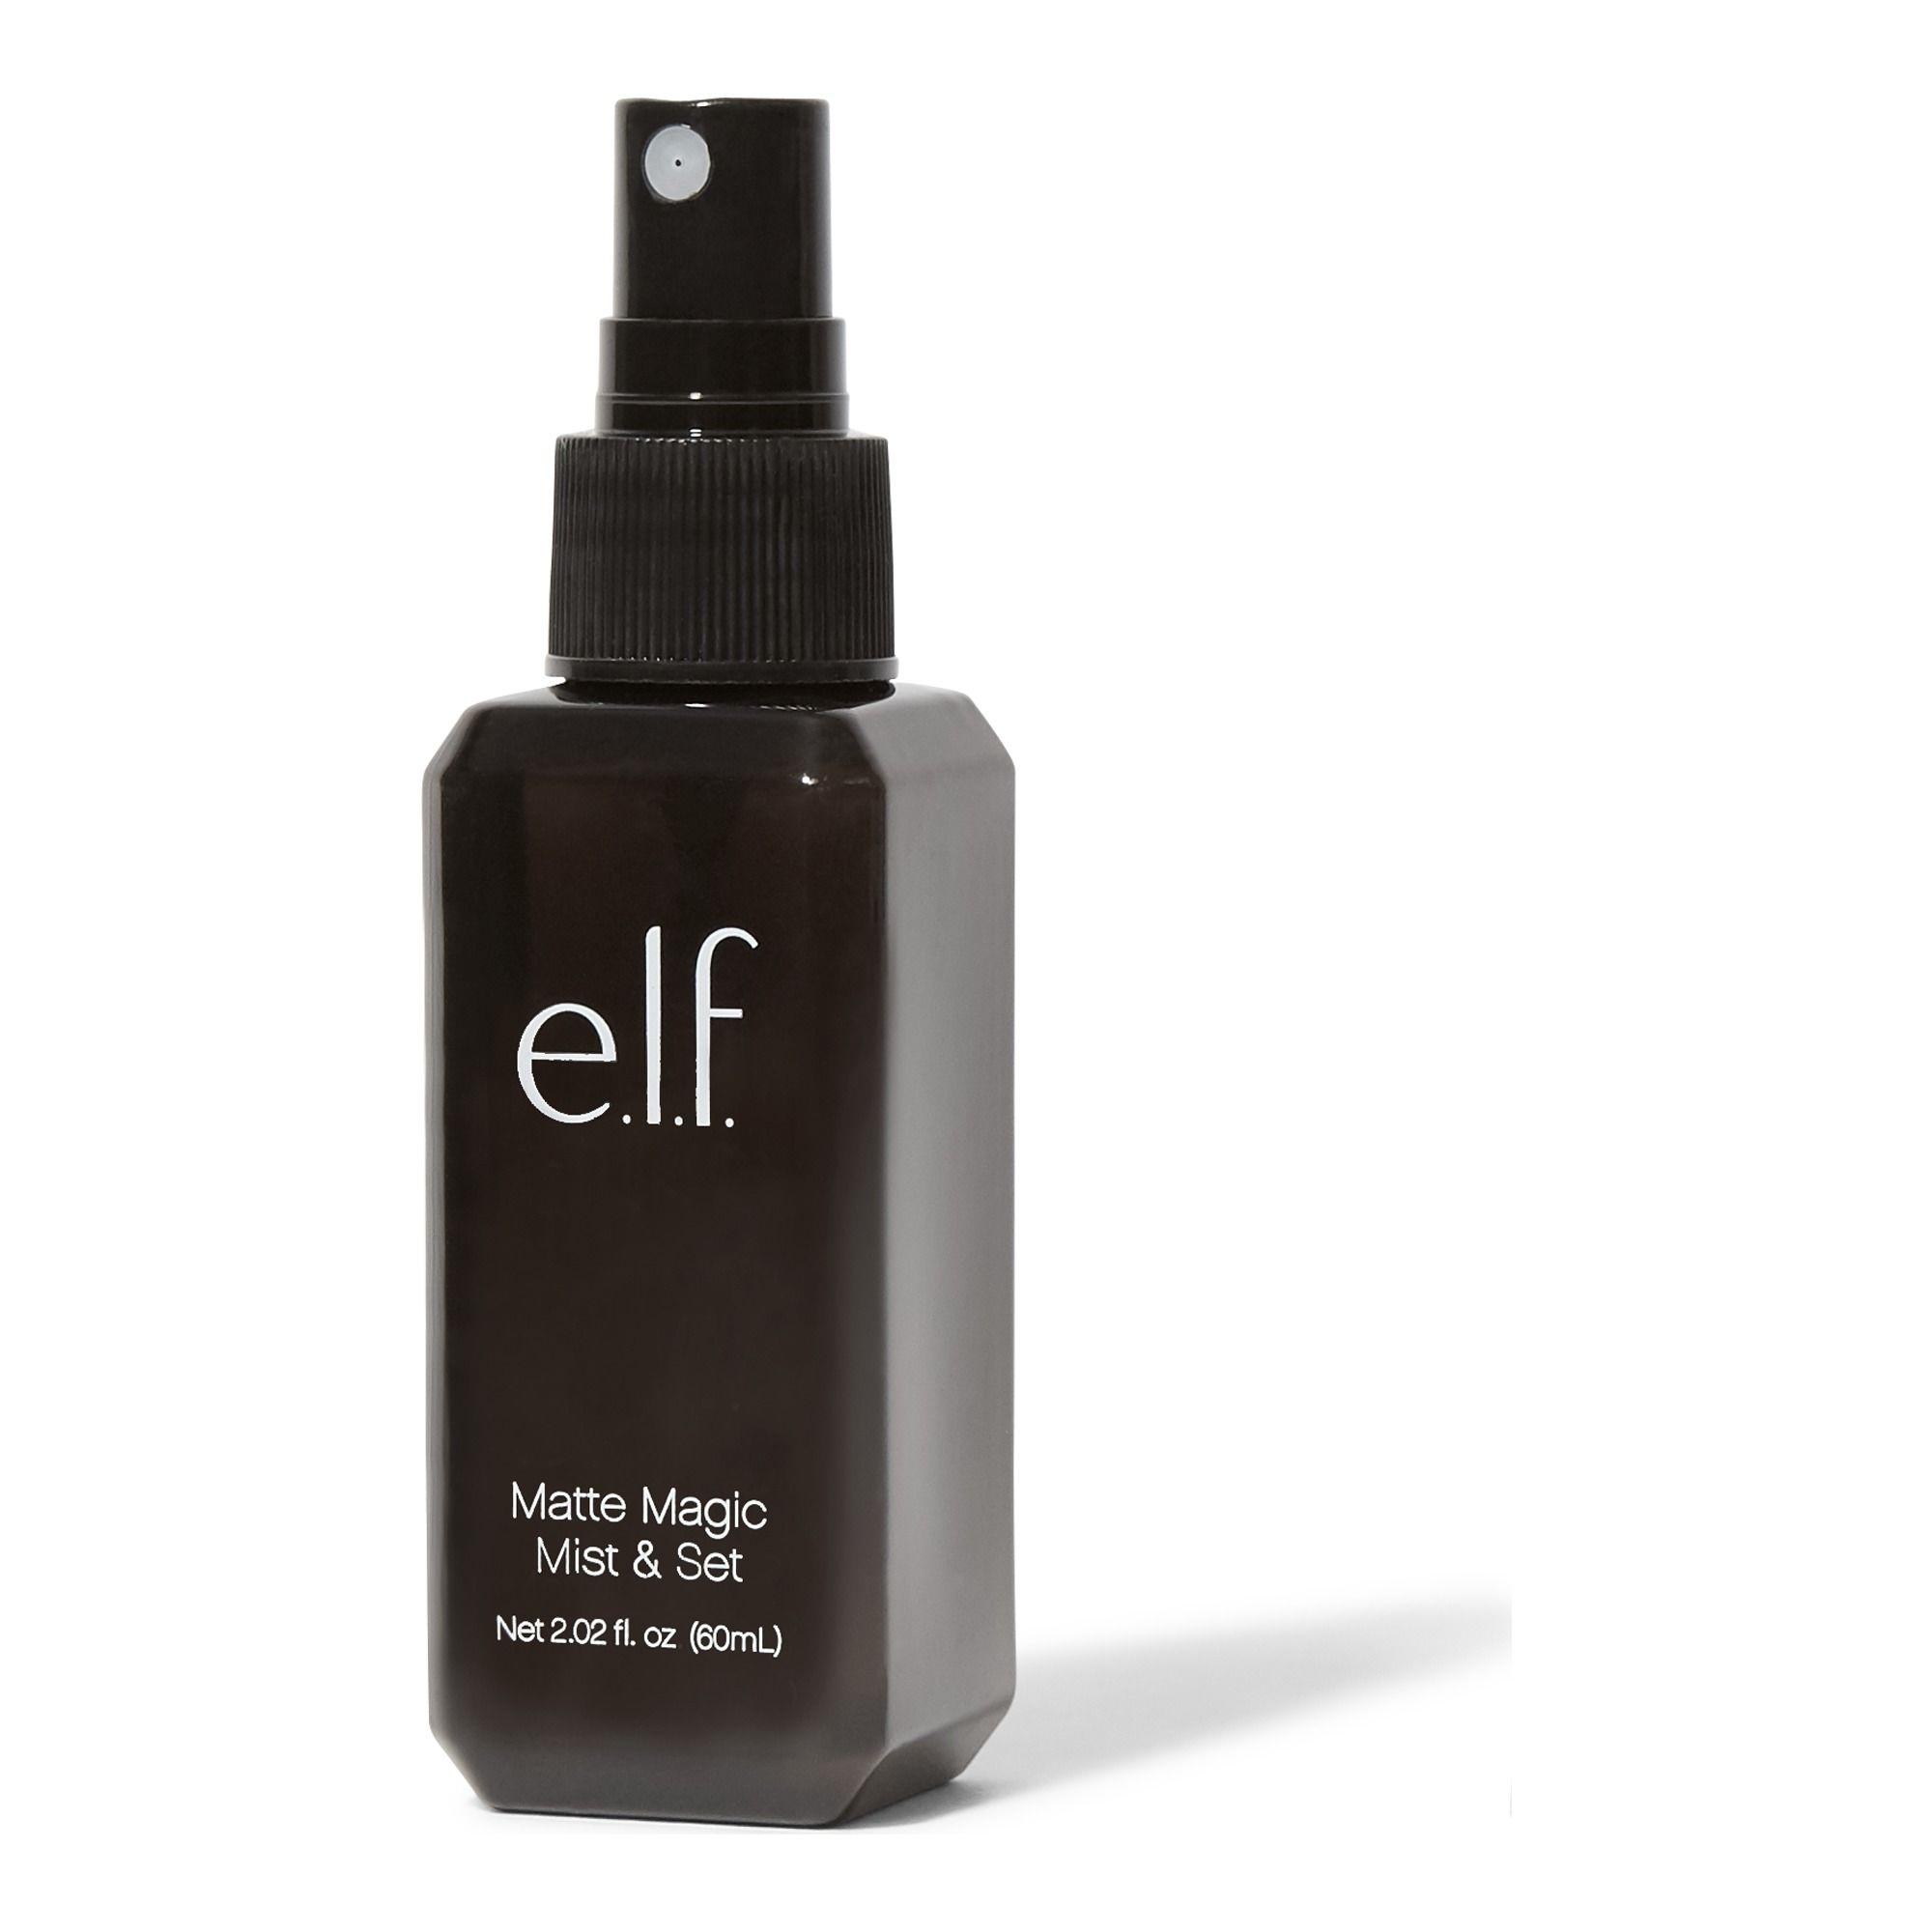 e.l.f. Cosmetics Matte Magic Mist & Set